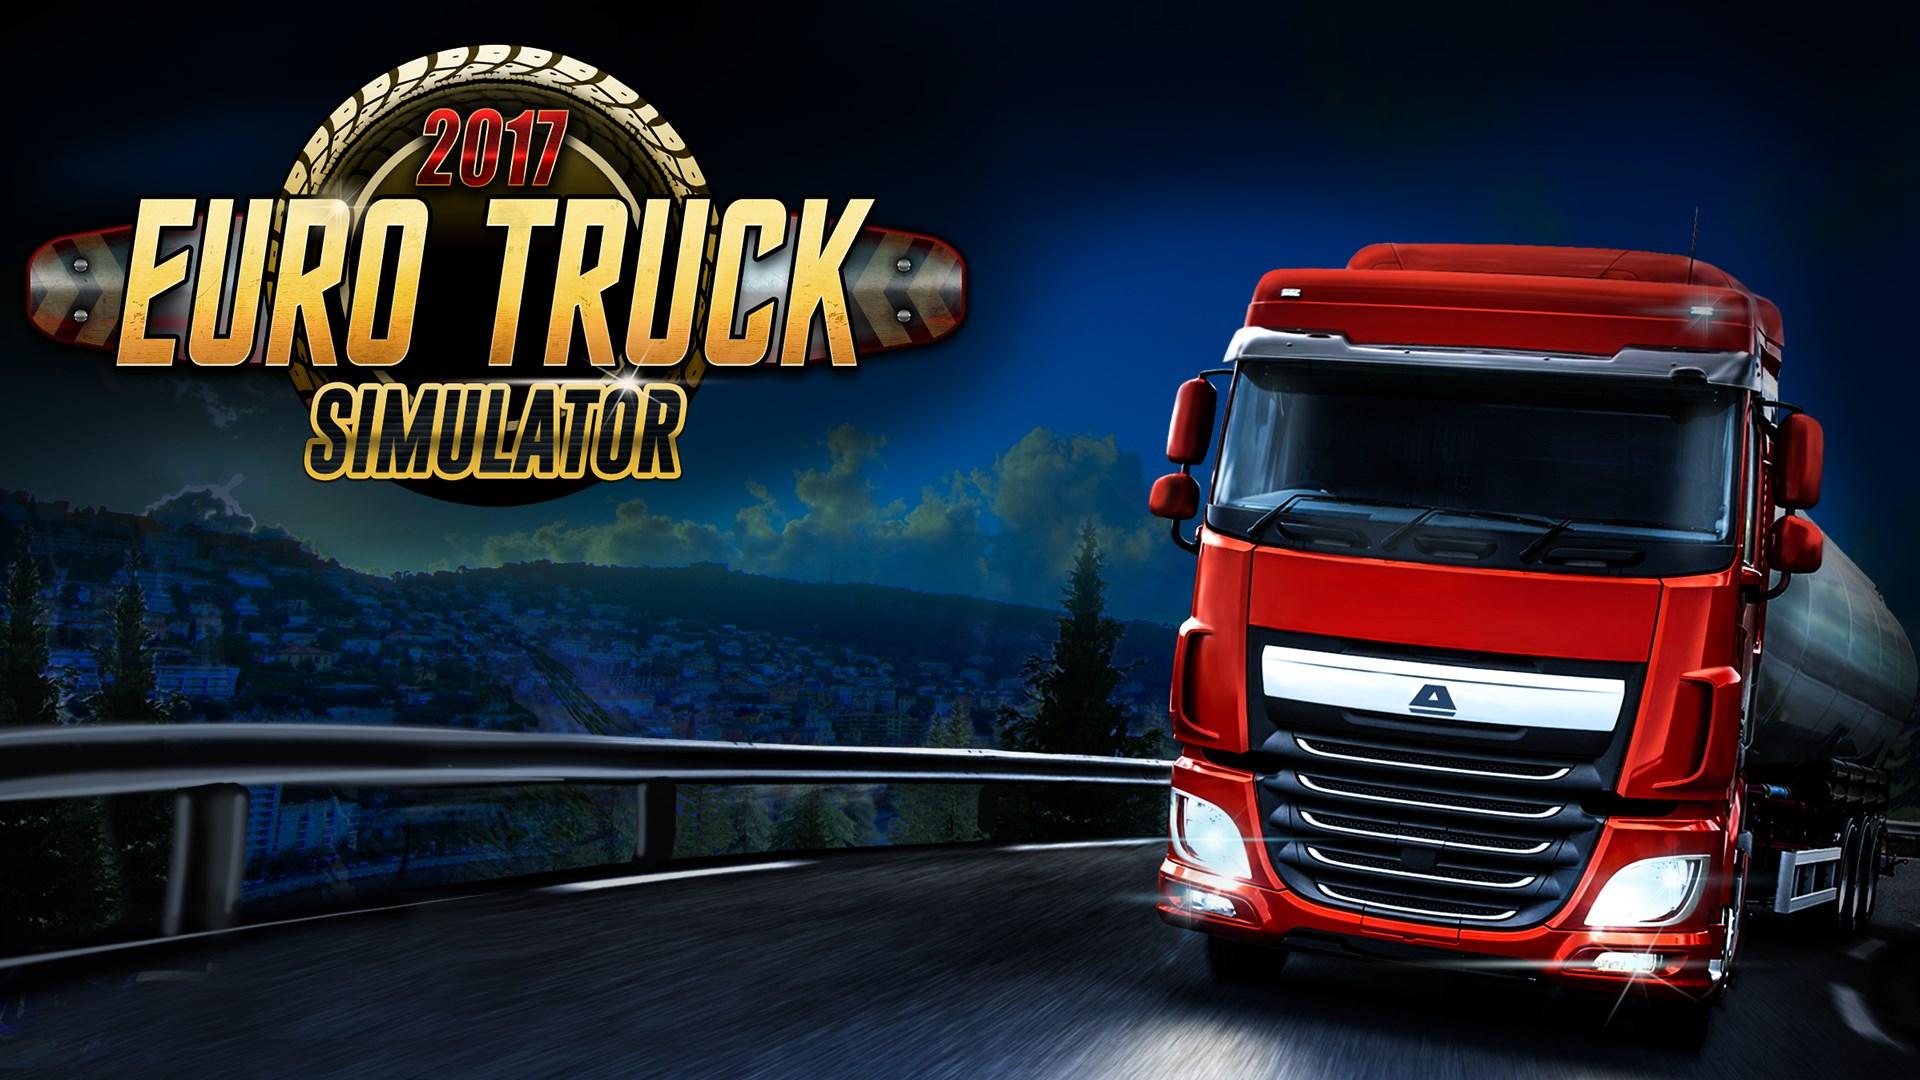 Get Euro Truck Simulator 2017 Microsoft Store